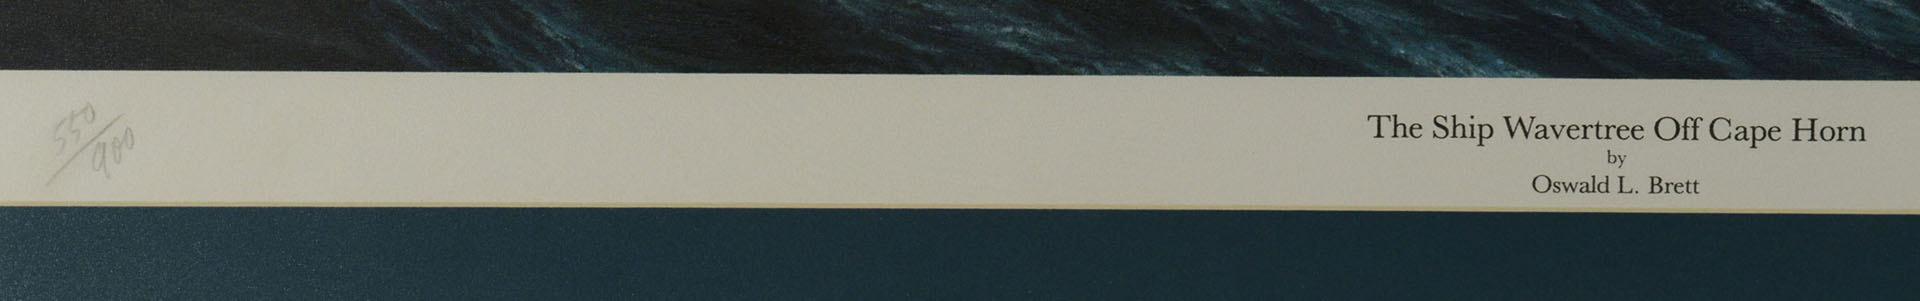 Lot 346: 2 Limited Edition Nautical Prints: Brett & Stobart